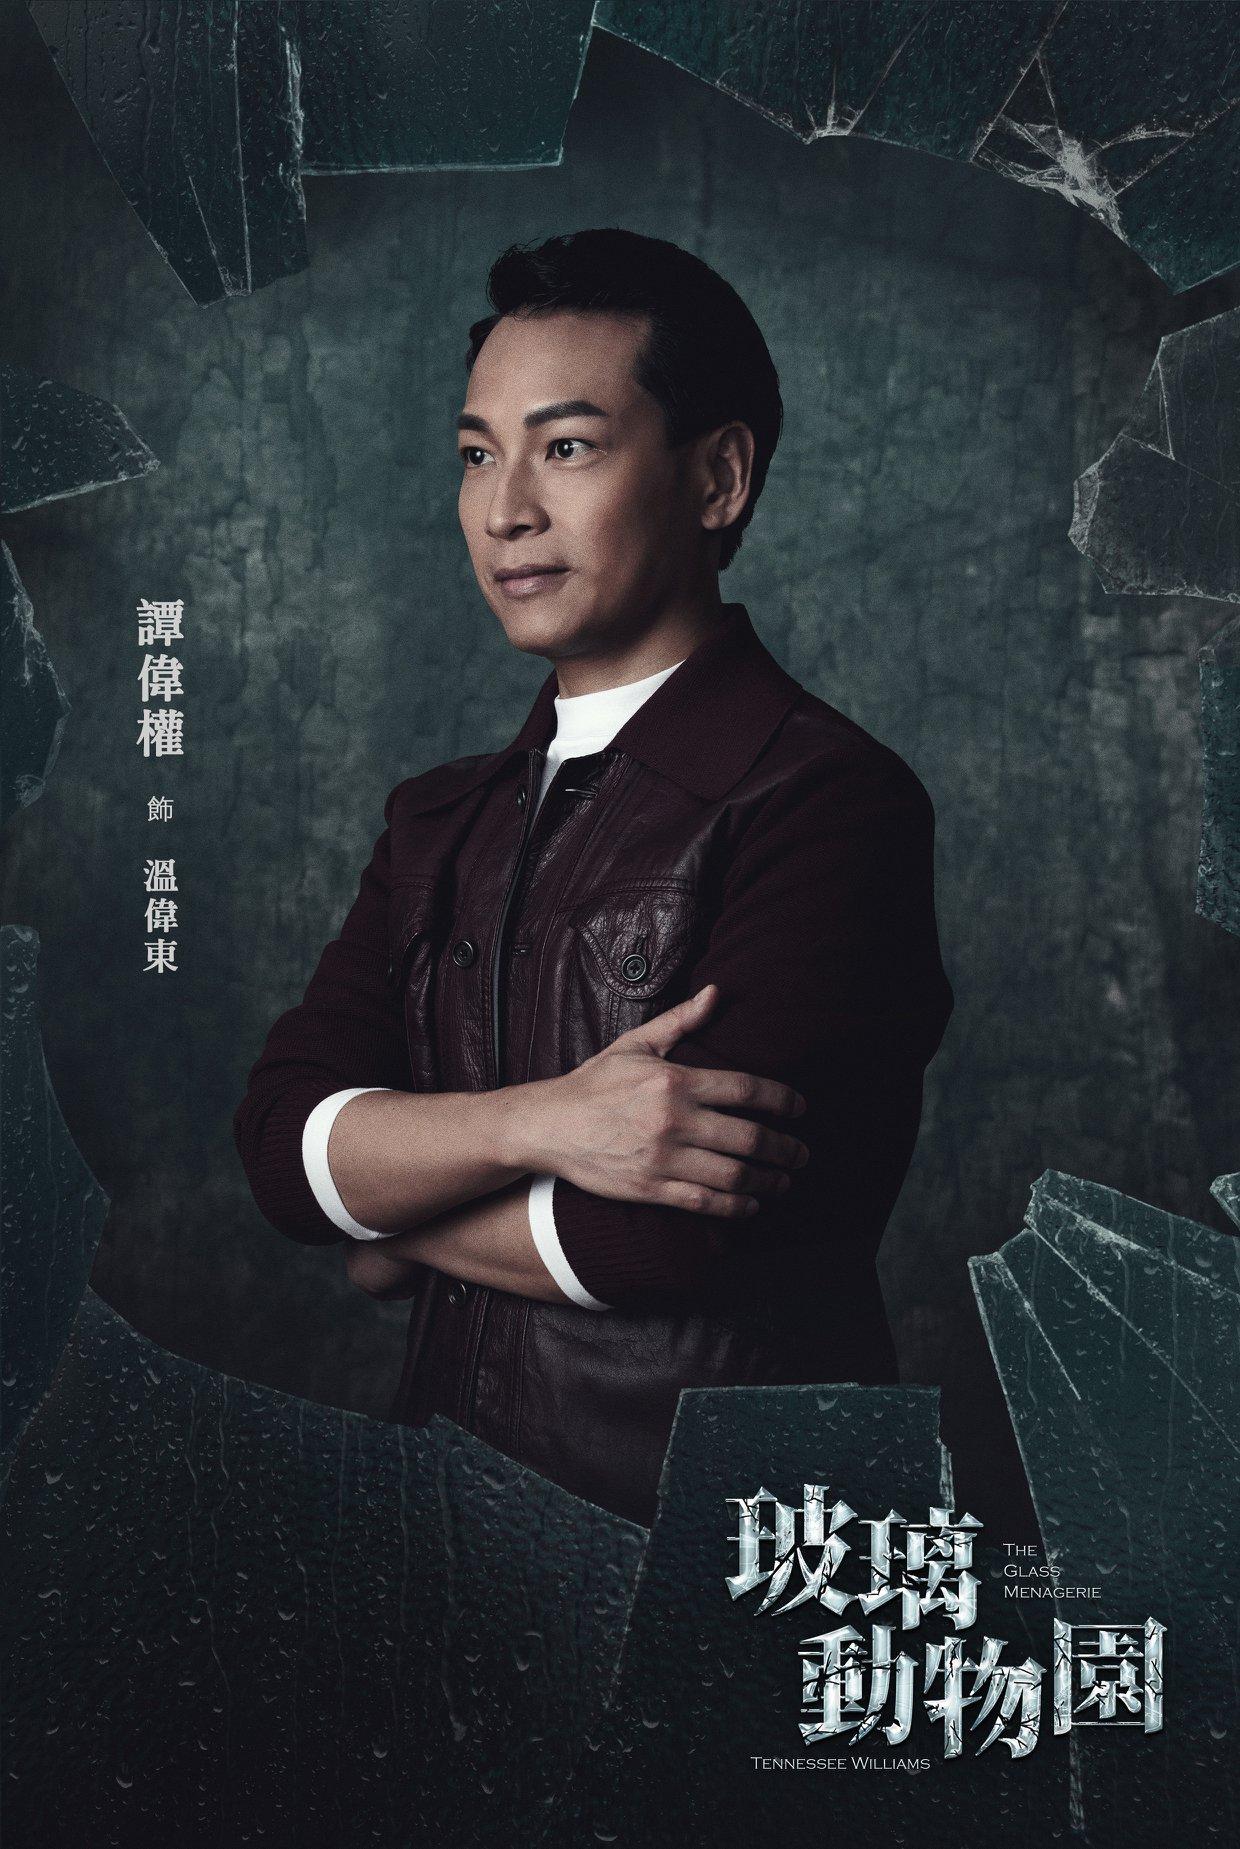 The Glass Menagerie. Gary 譚偉權. Hong Kong. 2018